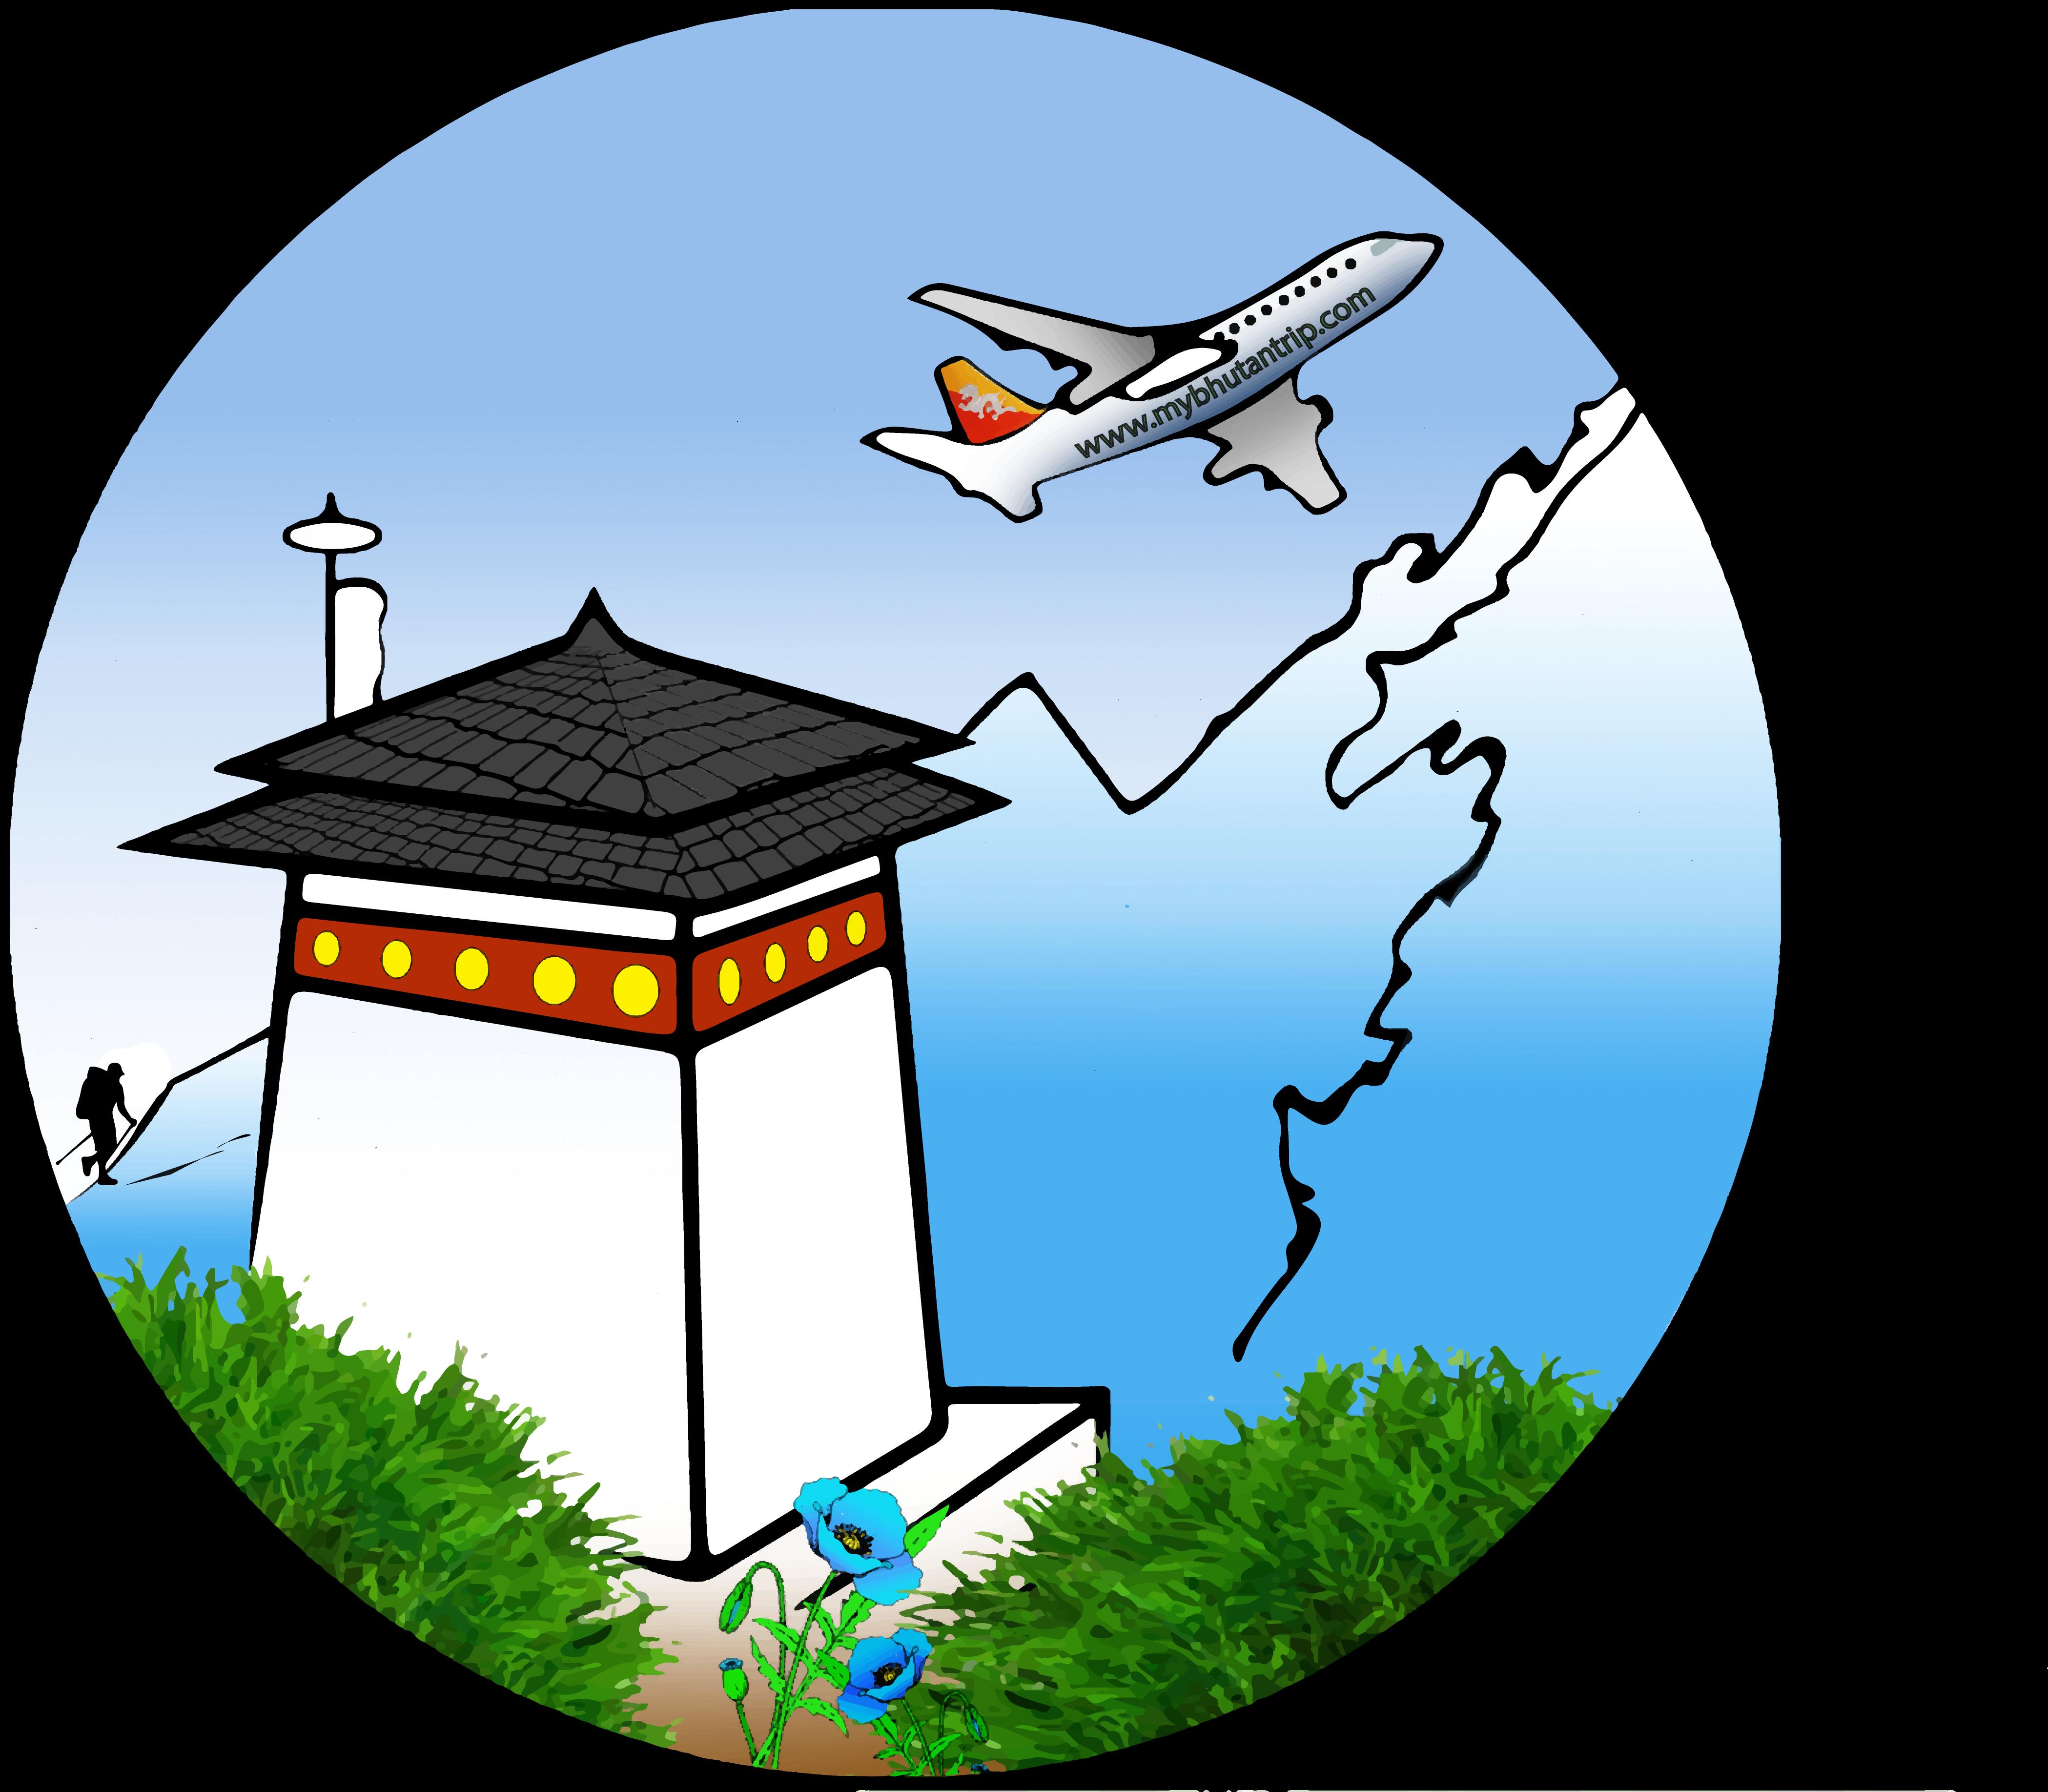 Bhutan Tour Operators Travel Agents And Companies In Bhutan